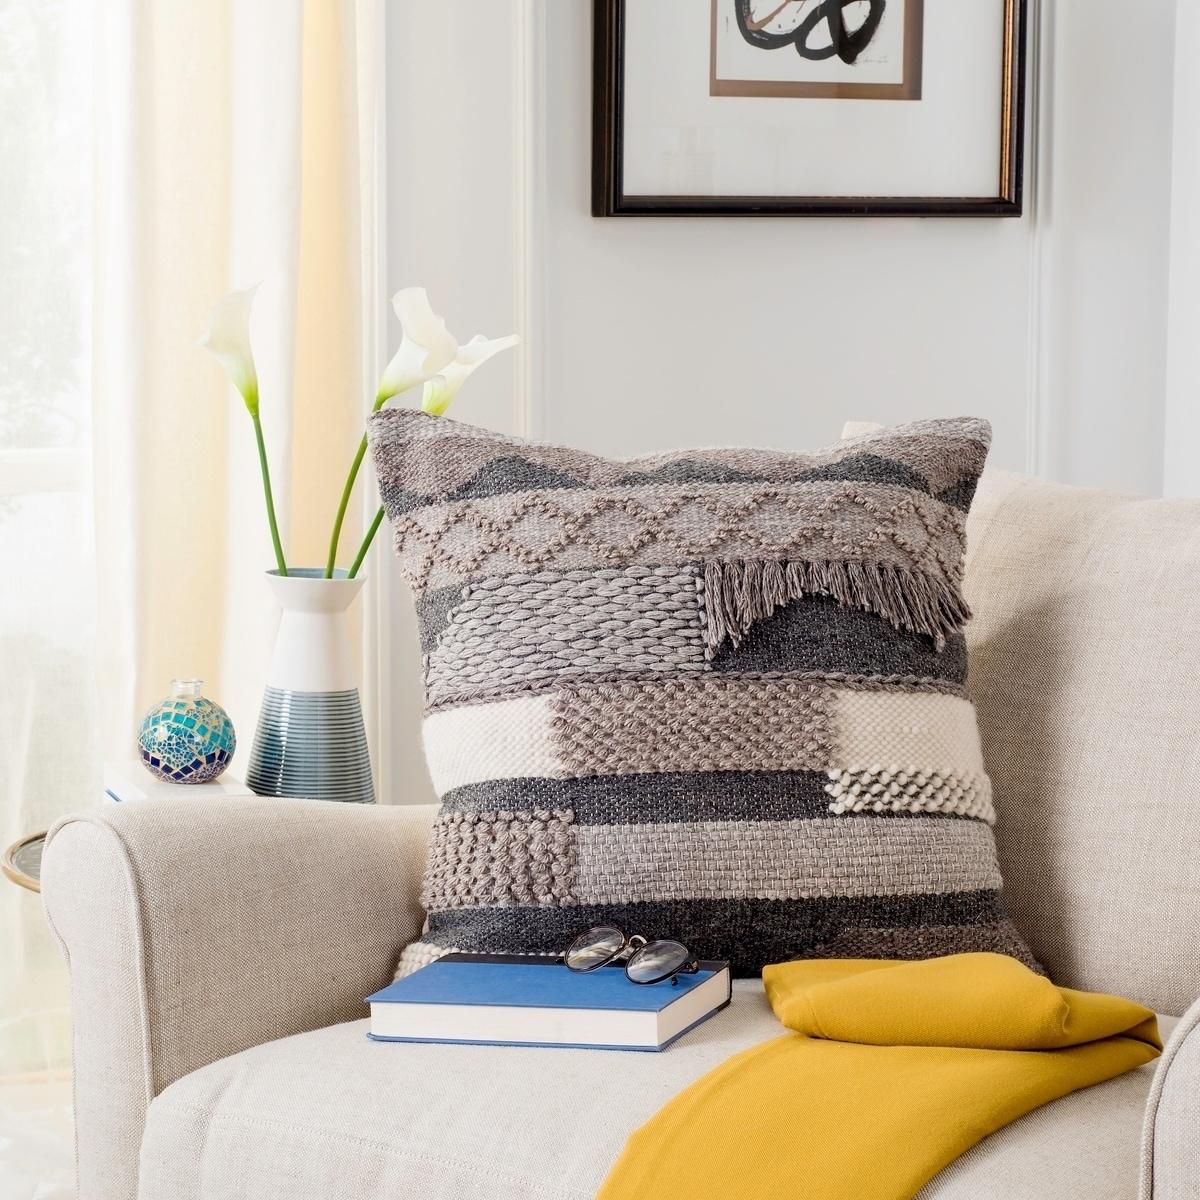 Details About Safavieh Gareth Nomad Desert Wool 20 Inch Decorative Pillow Assorted 1 8 X 1 8